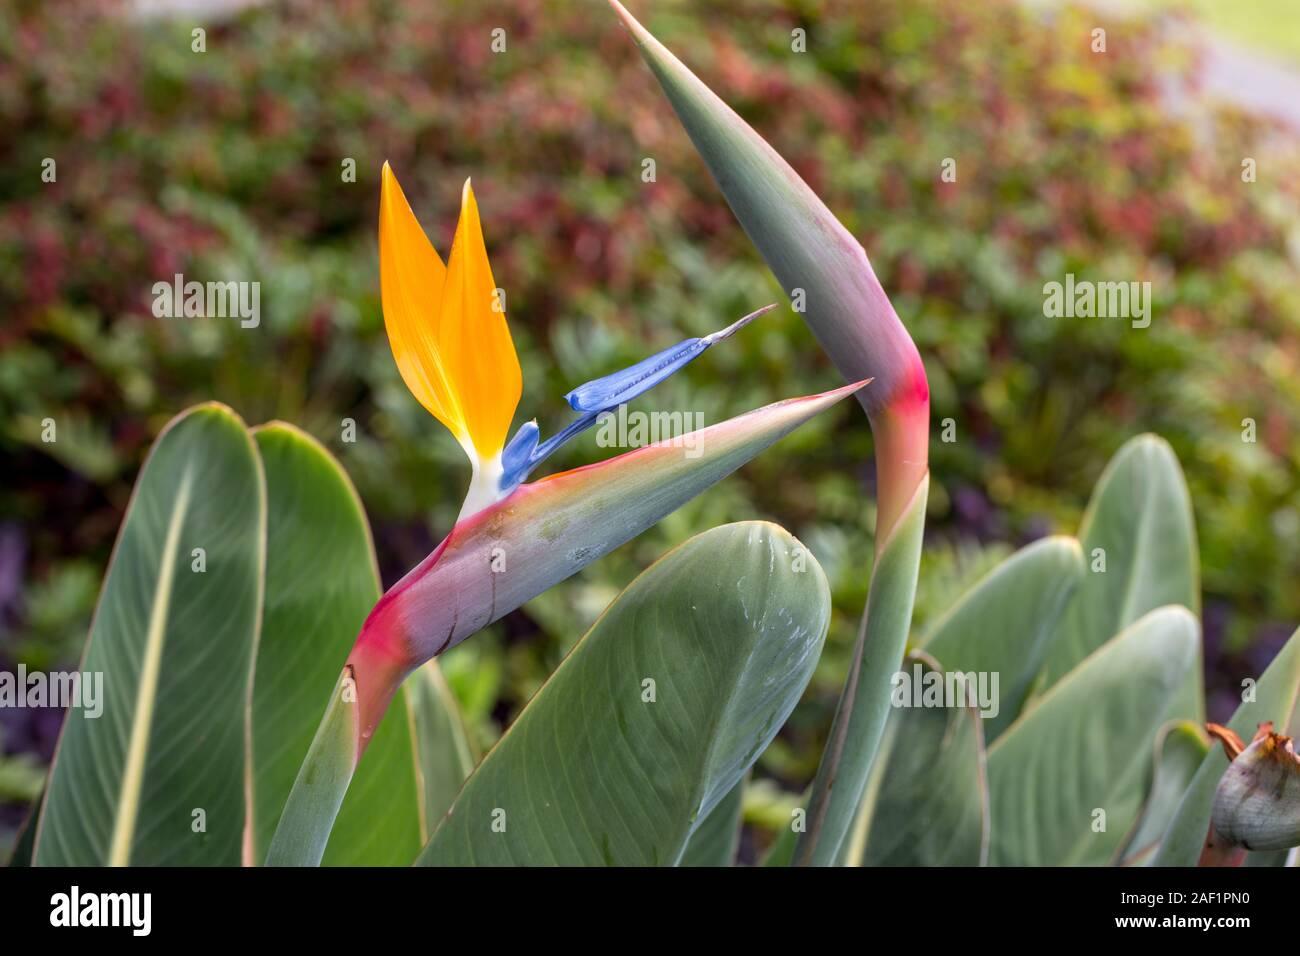 Tropical Flower Strelitzia Or Bird Of Paradise On Madeira Island Portugal Stock Photo Alamy